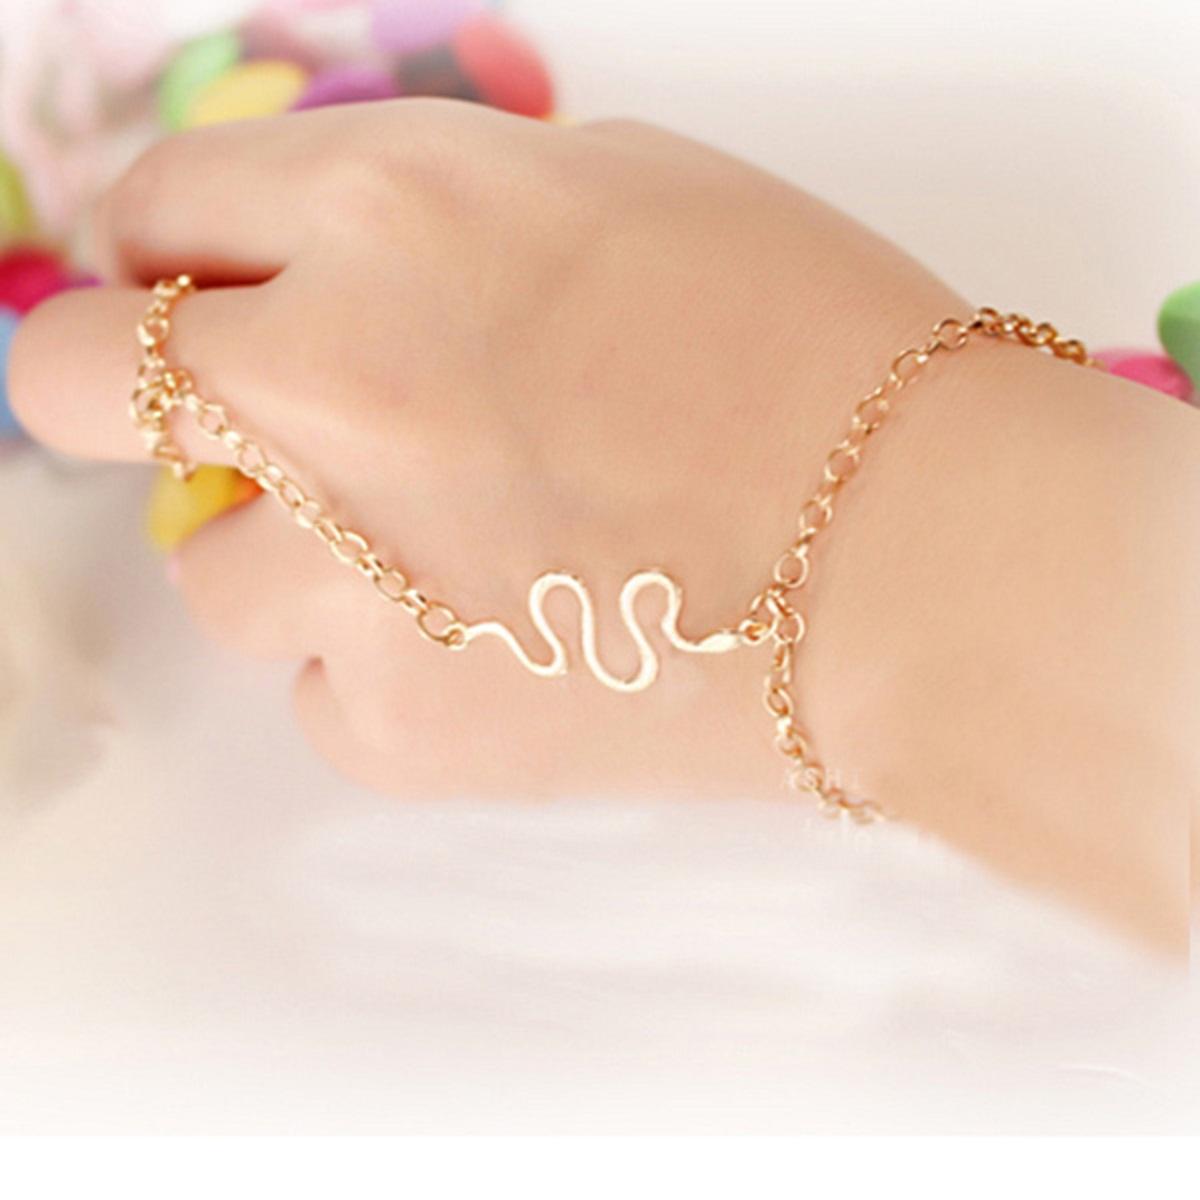 Dynamic Views: New Bracelets Ring And Bangle Fashion Jewelry Wallpaper